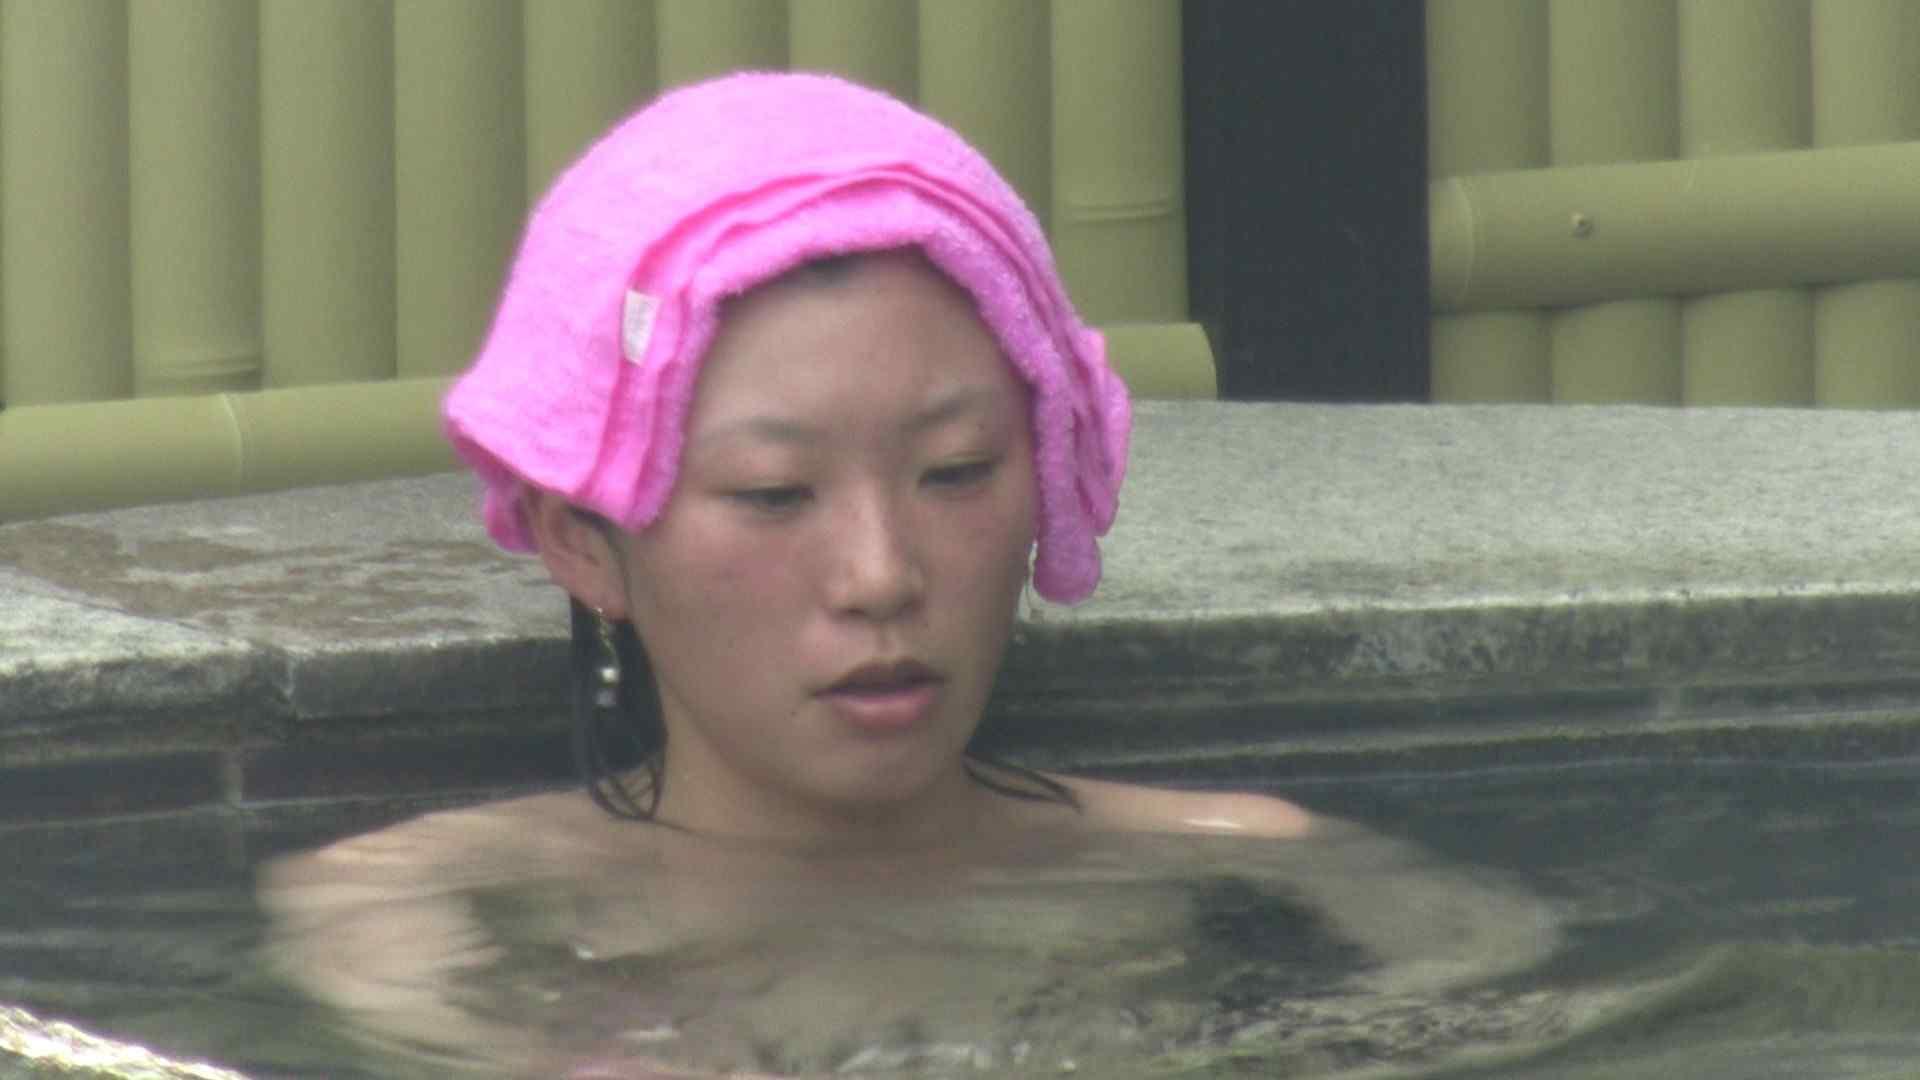 Aquaな露天風呂Vol.127 盗撮師作品  77pic 57